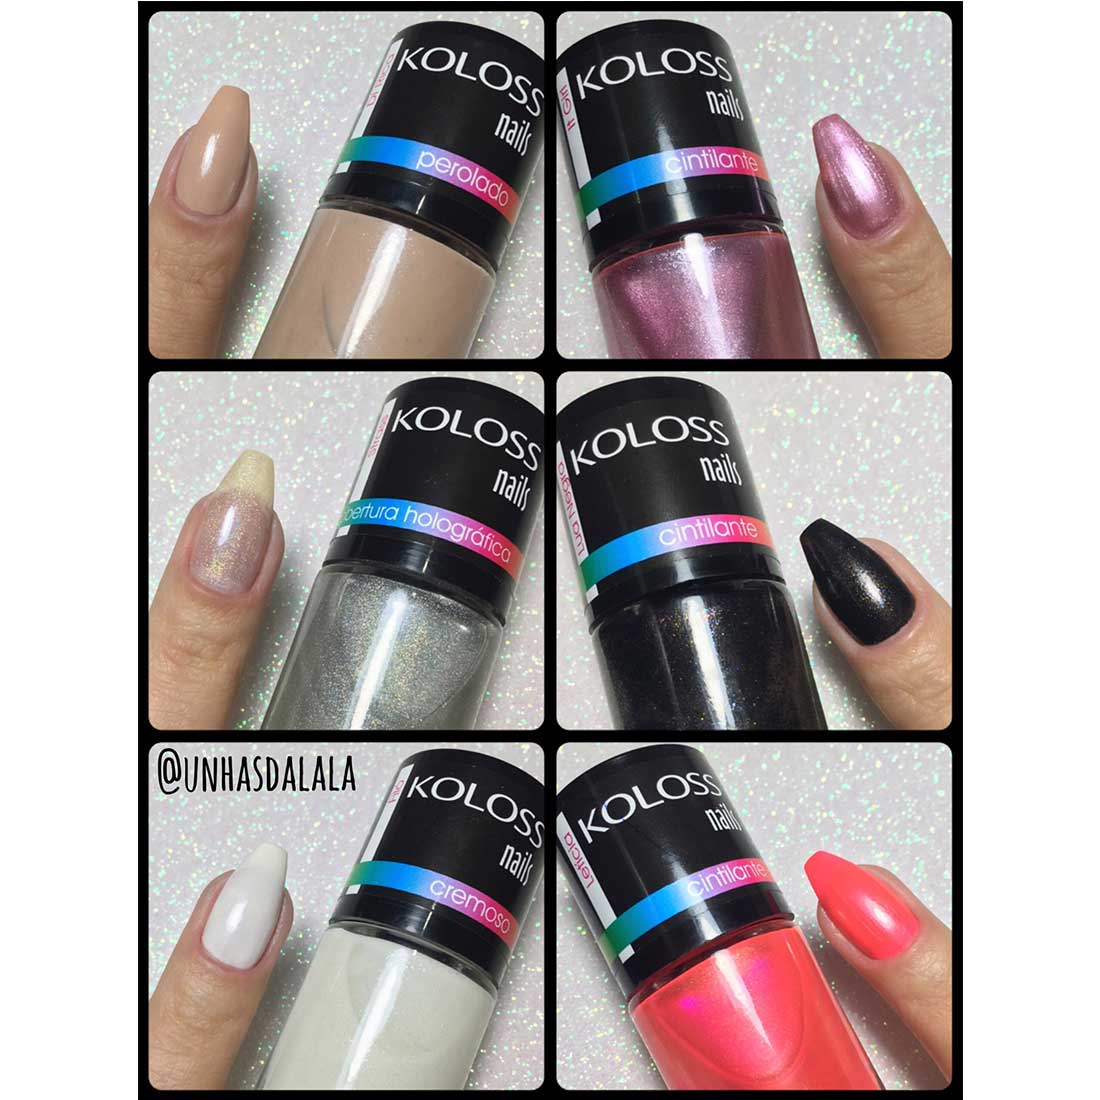 Press Kit Esmalte Koloss (Koloss Nails)